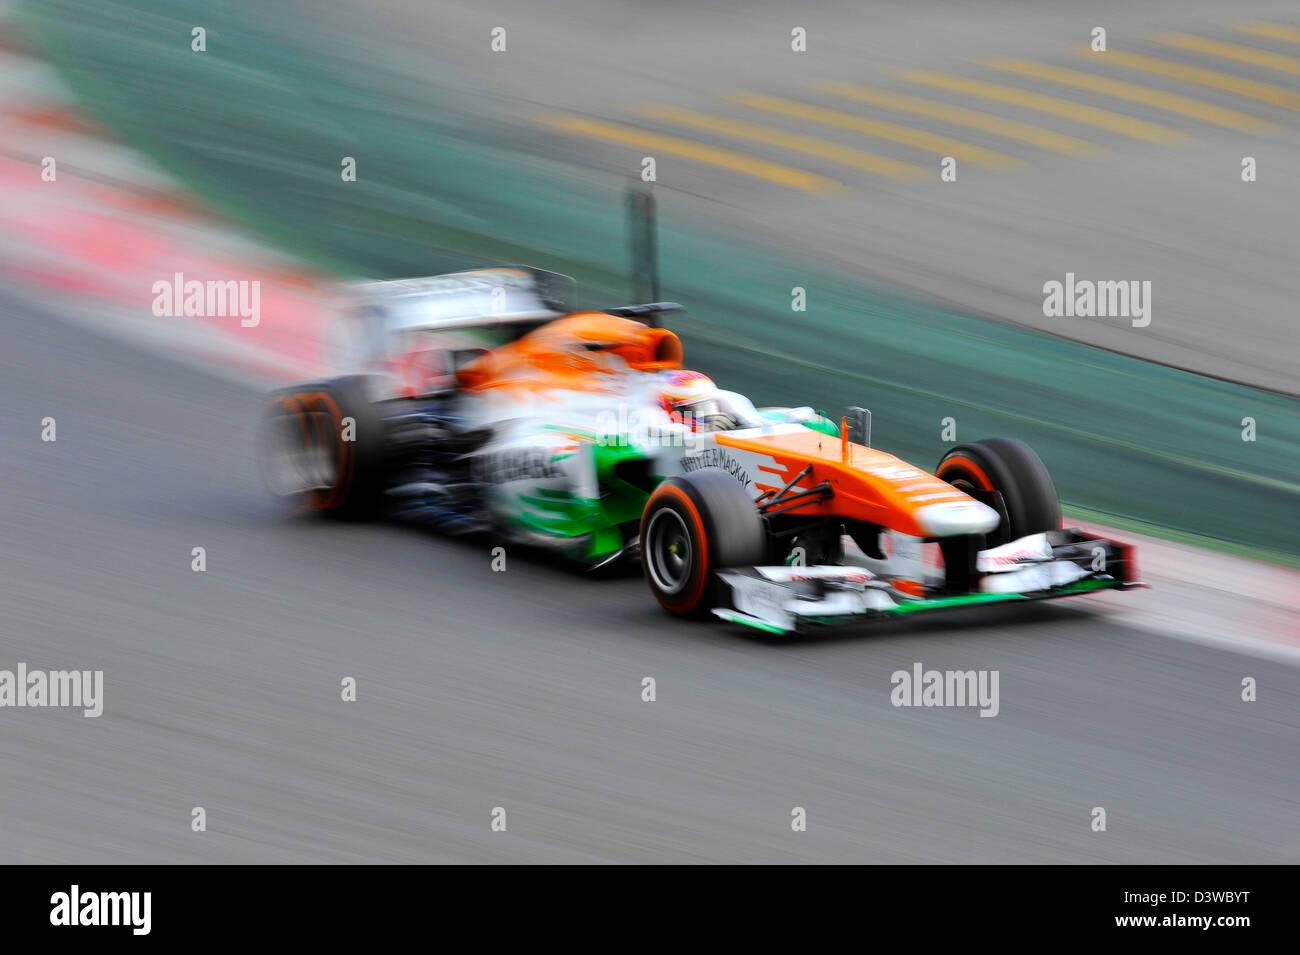 Paul Di Resta (SCO), Force India VJM06 during Formula One tests on Circuit de Catalunya racetrack near Barcelona, - Stock Image